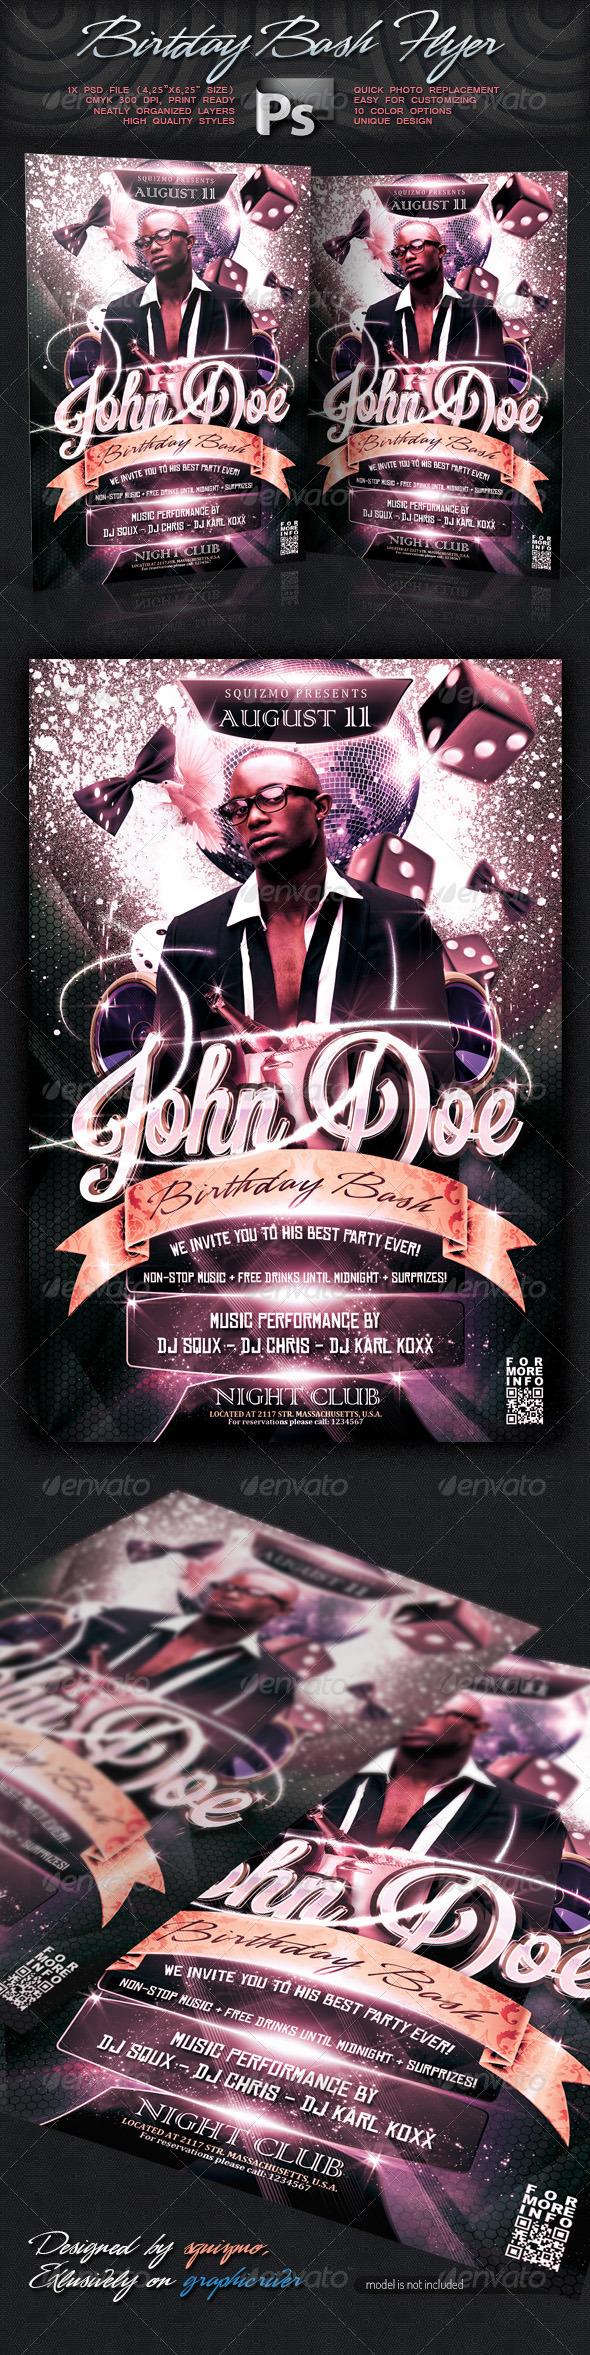 GraphicRiver Birthday Bash Flyer 2622255